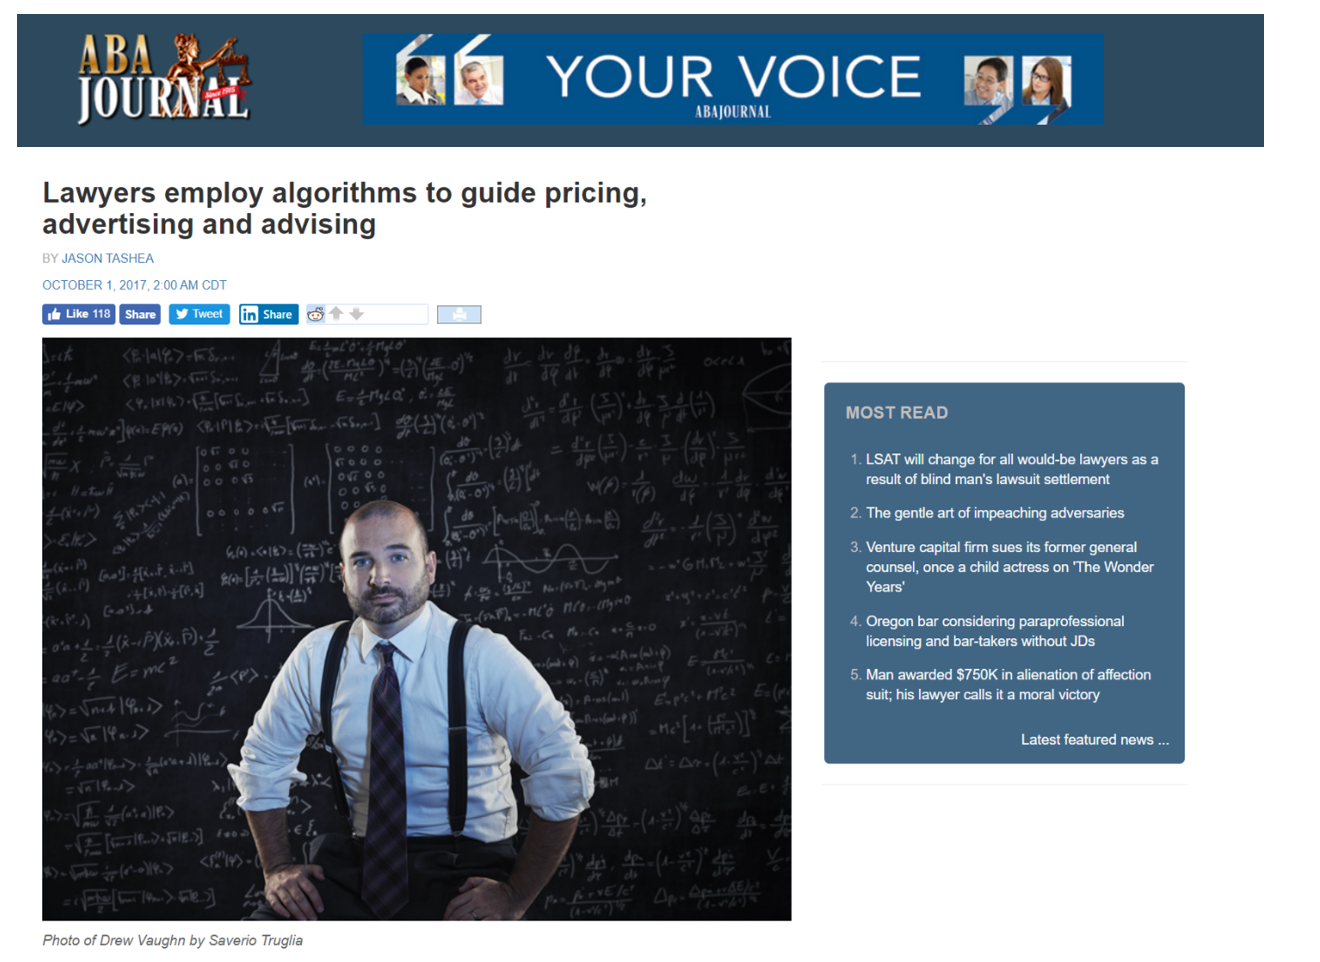 Drew Vaughn of Deviant Marketing